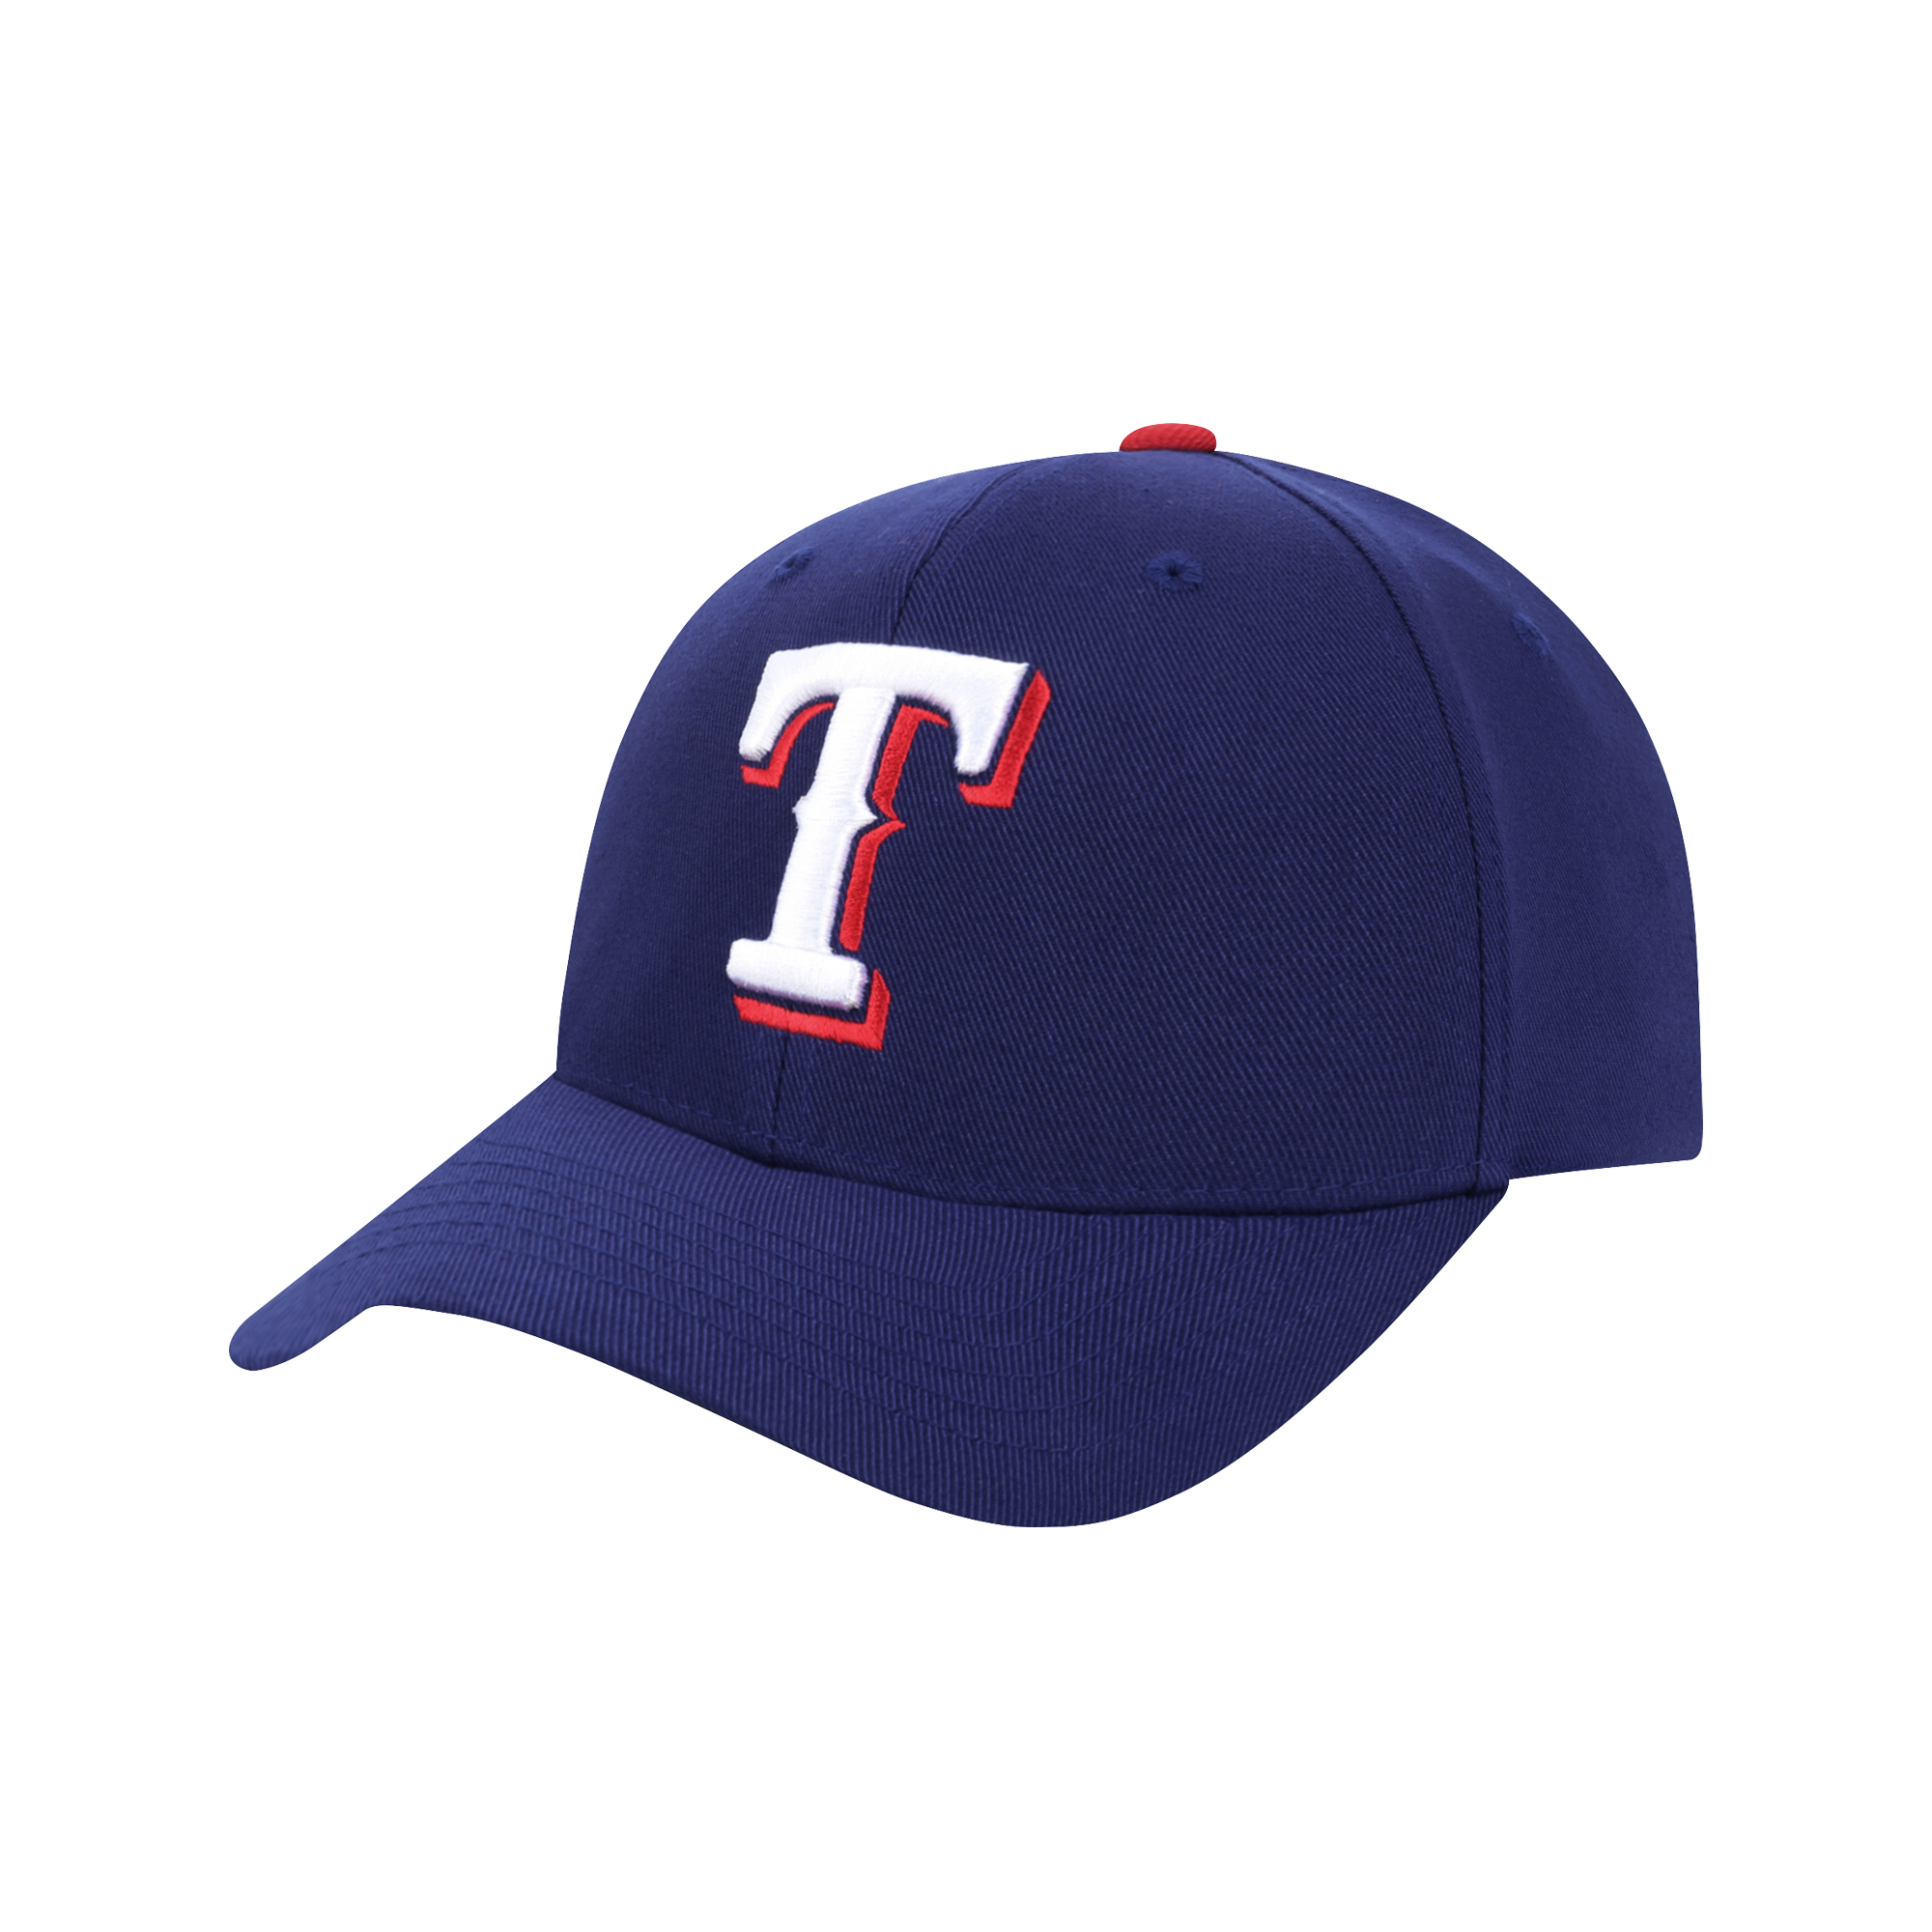 TEXAS RANGERS BATTER CURVED CAP